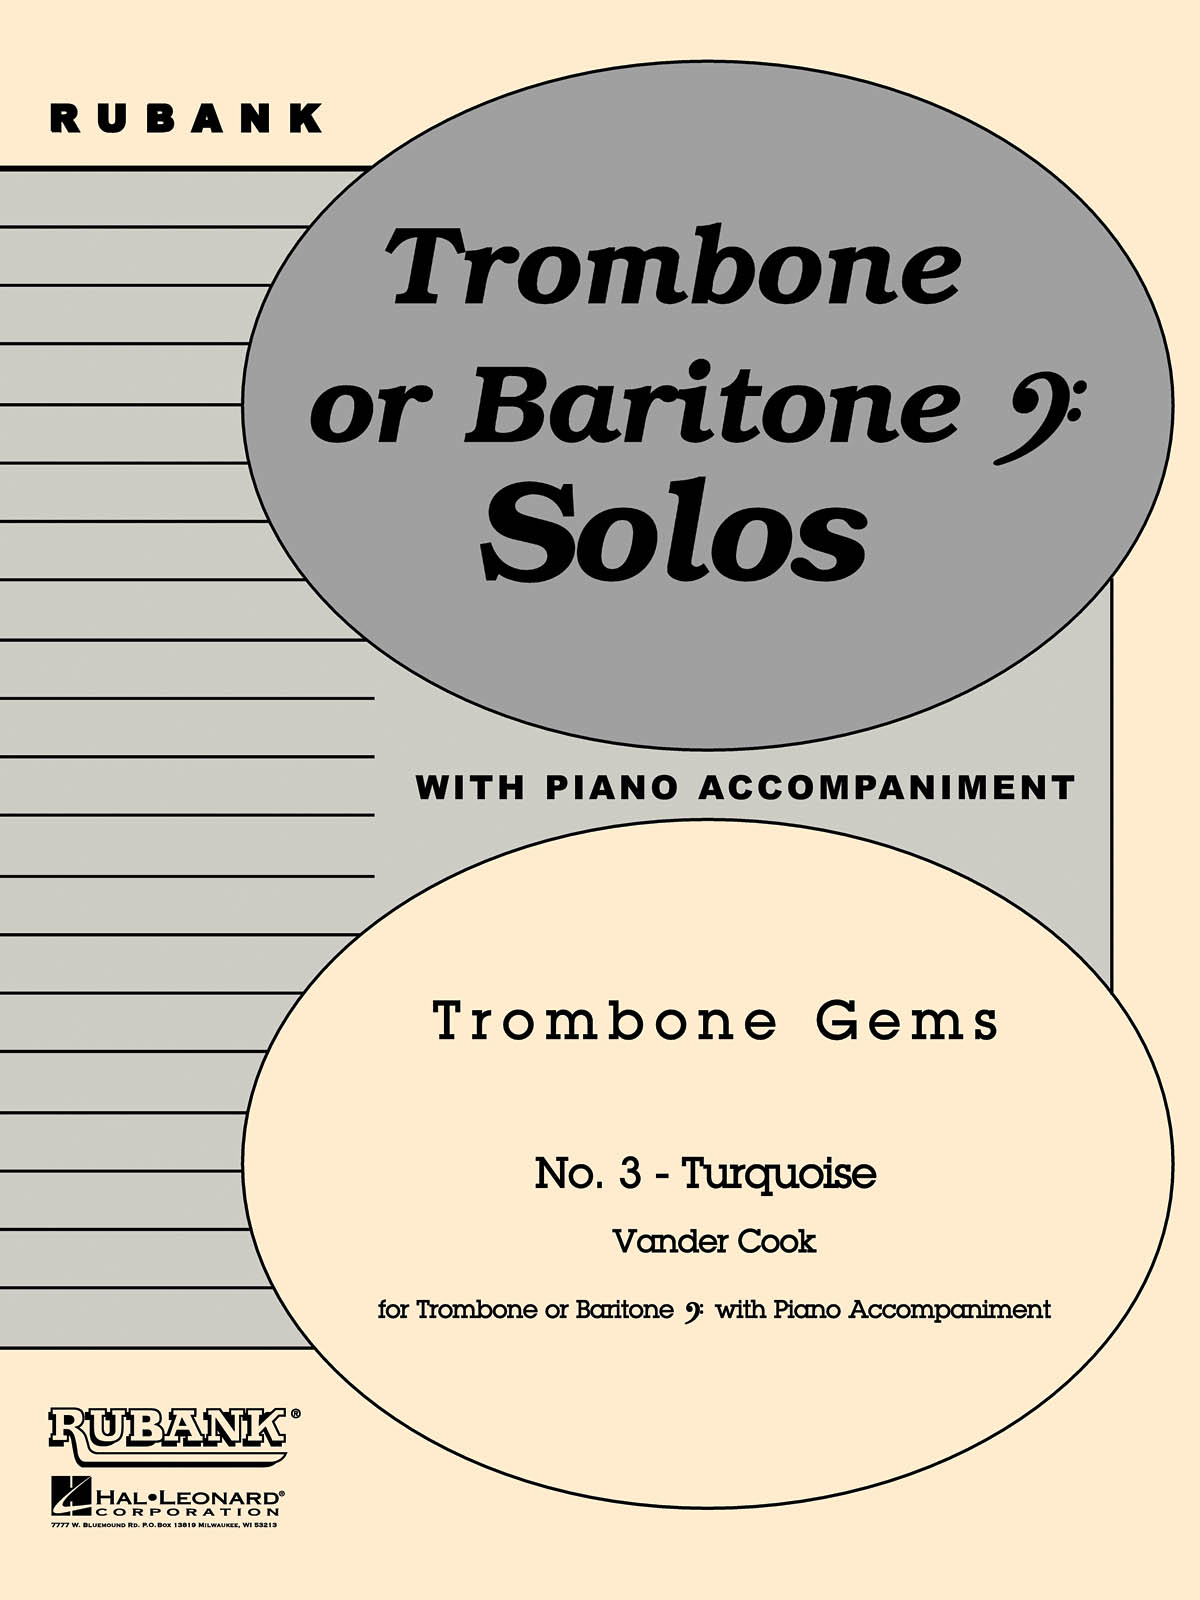 H.A. VanderCook: Turquoise (Trombone Gems No. 3): Trombone and Accomp.: